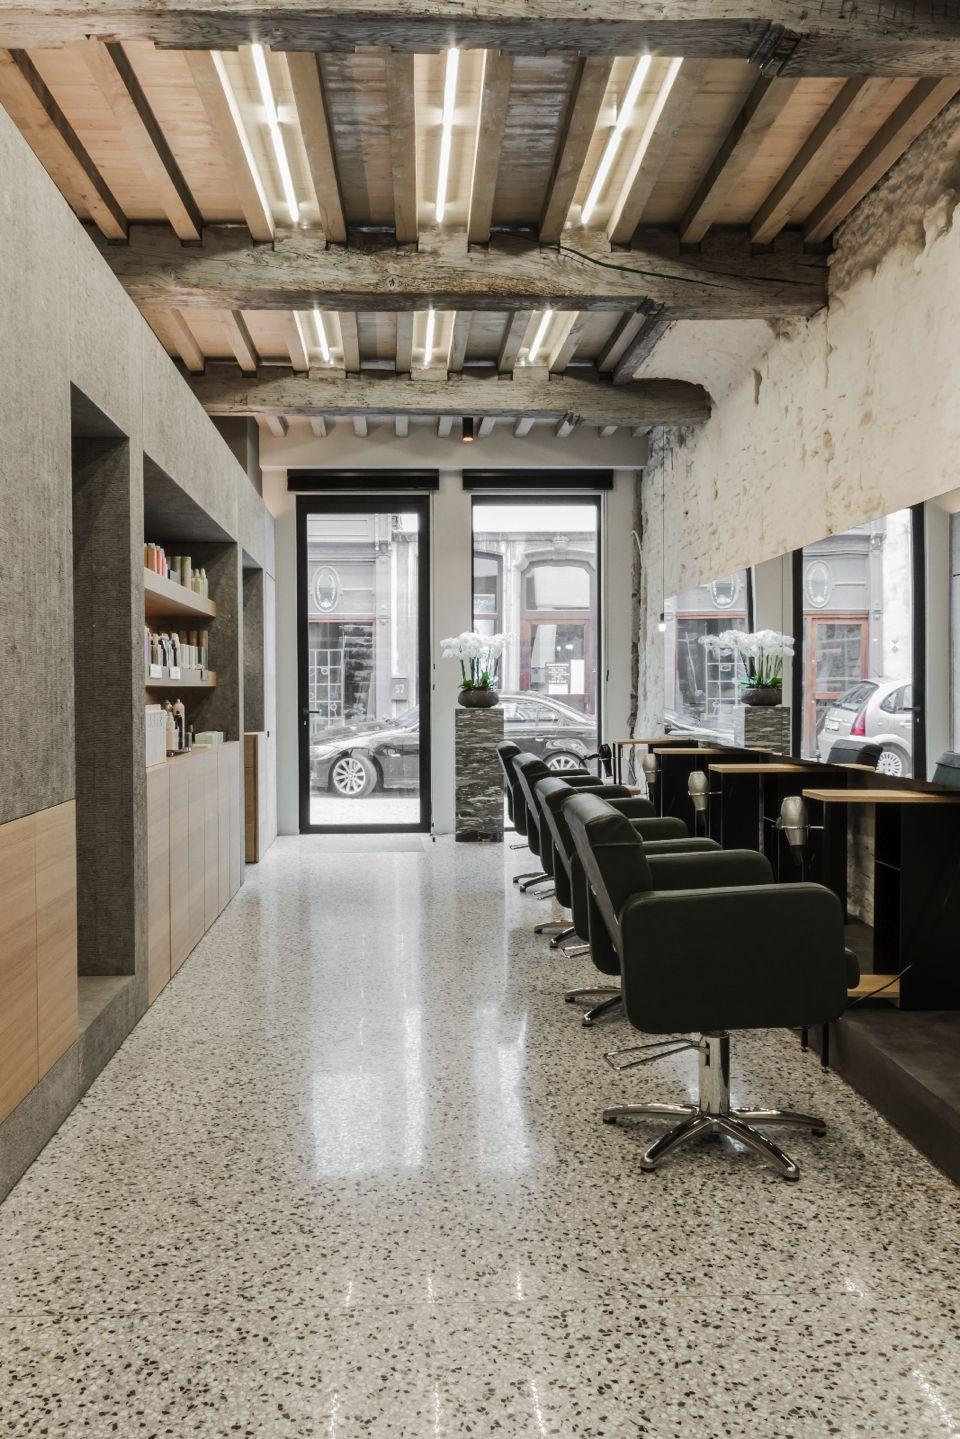 Hair Salon Salon Interior Design Hair Salon Interior Hair Salon Decor